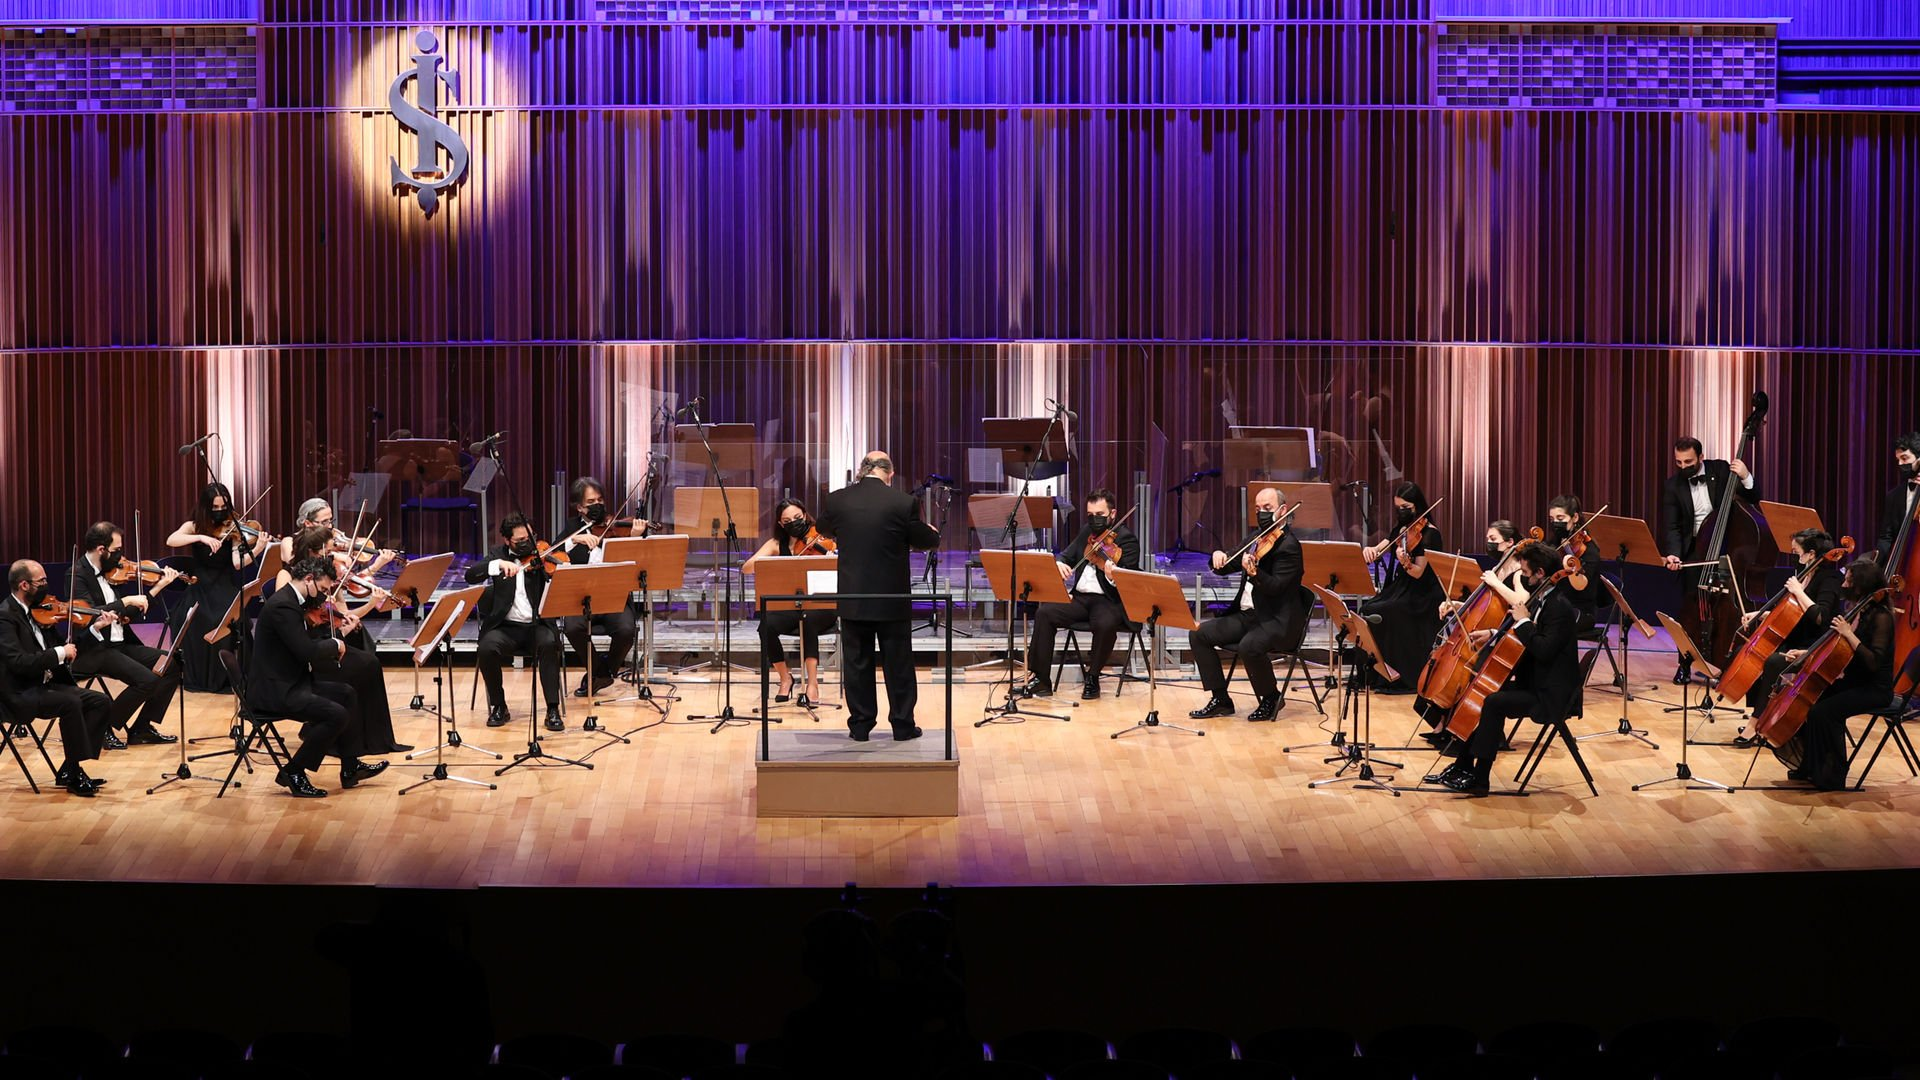 İş Sanat sezonu İstanbul Ensemble'la tamamlıyor